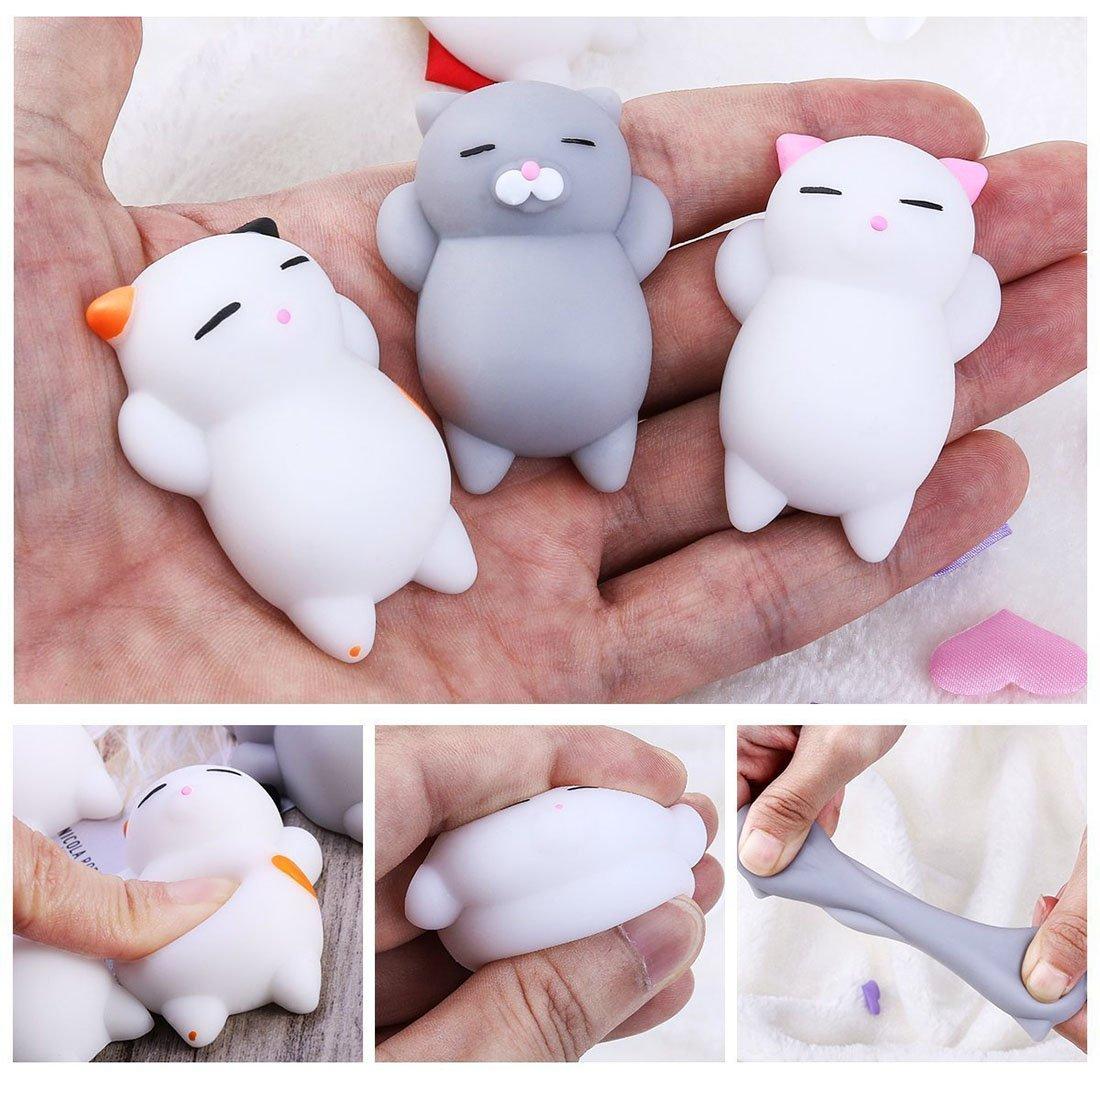 10pcs Mini Kawaii Animal Squishies Lento Aumento 3d Animales Elásticos Suaves Dibujos Animados Squeeze Juguetes Para El Estrés Relif Por Time4deals: ...